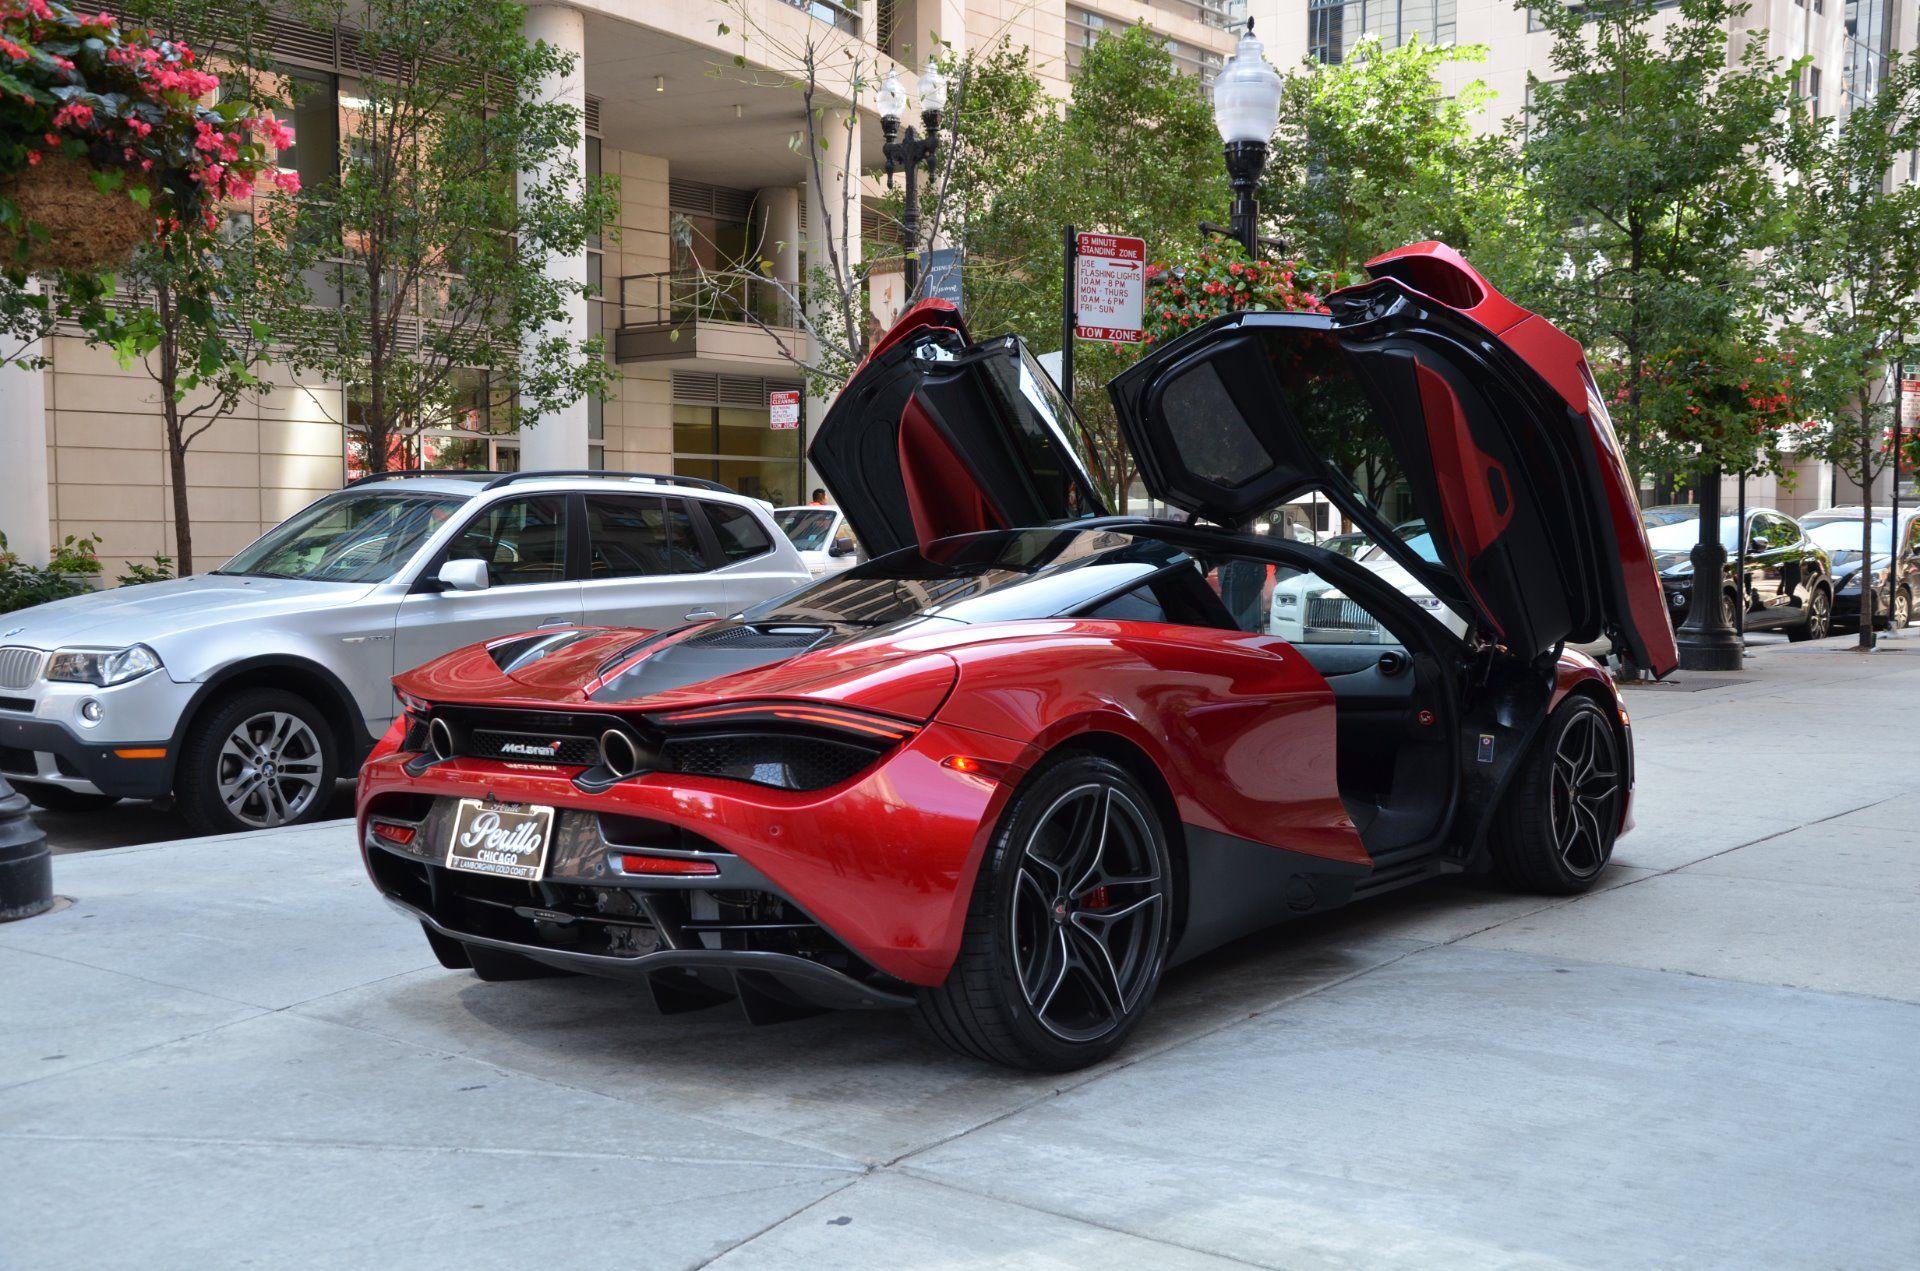 2018 Mclaren 720s Stock 00107 For Sale Near Chicago Il Il Mclaren Dealer Mclaren Top Cars Luxury Car Dealership